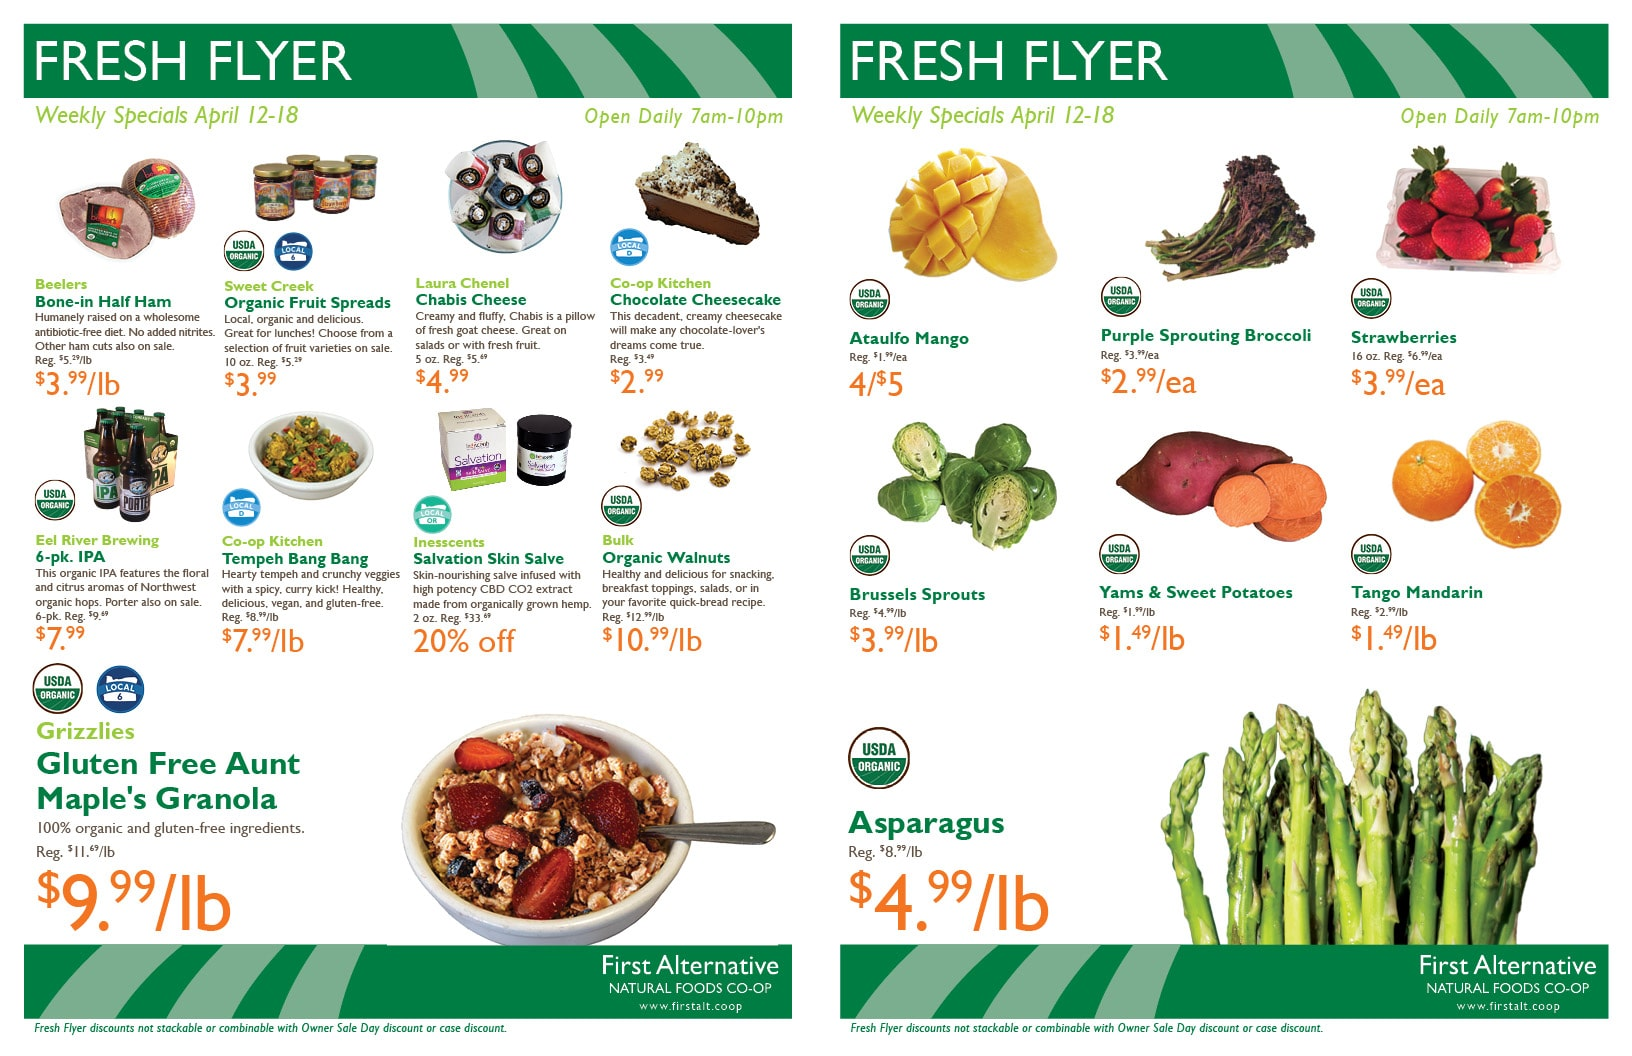 First Alternative Co-op Fresh Flyer Apr. 12-18